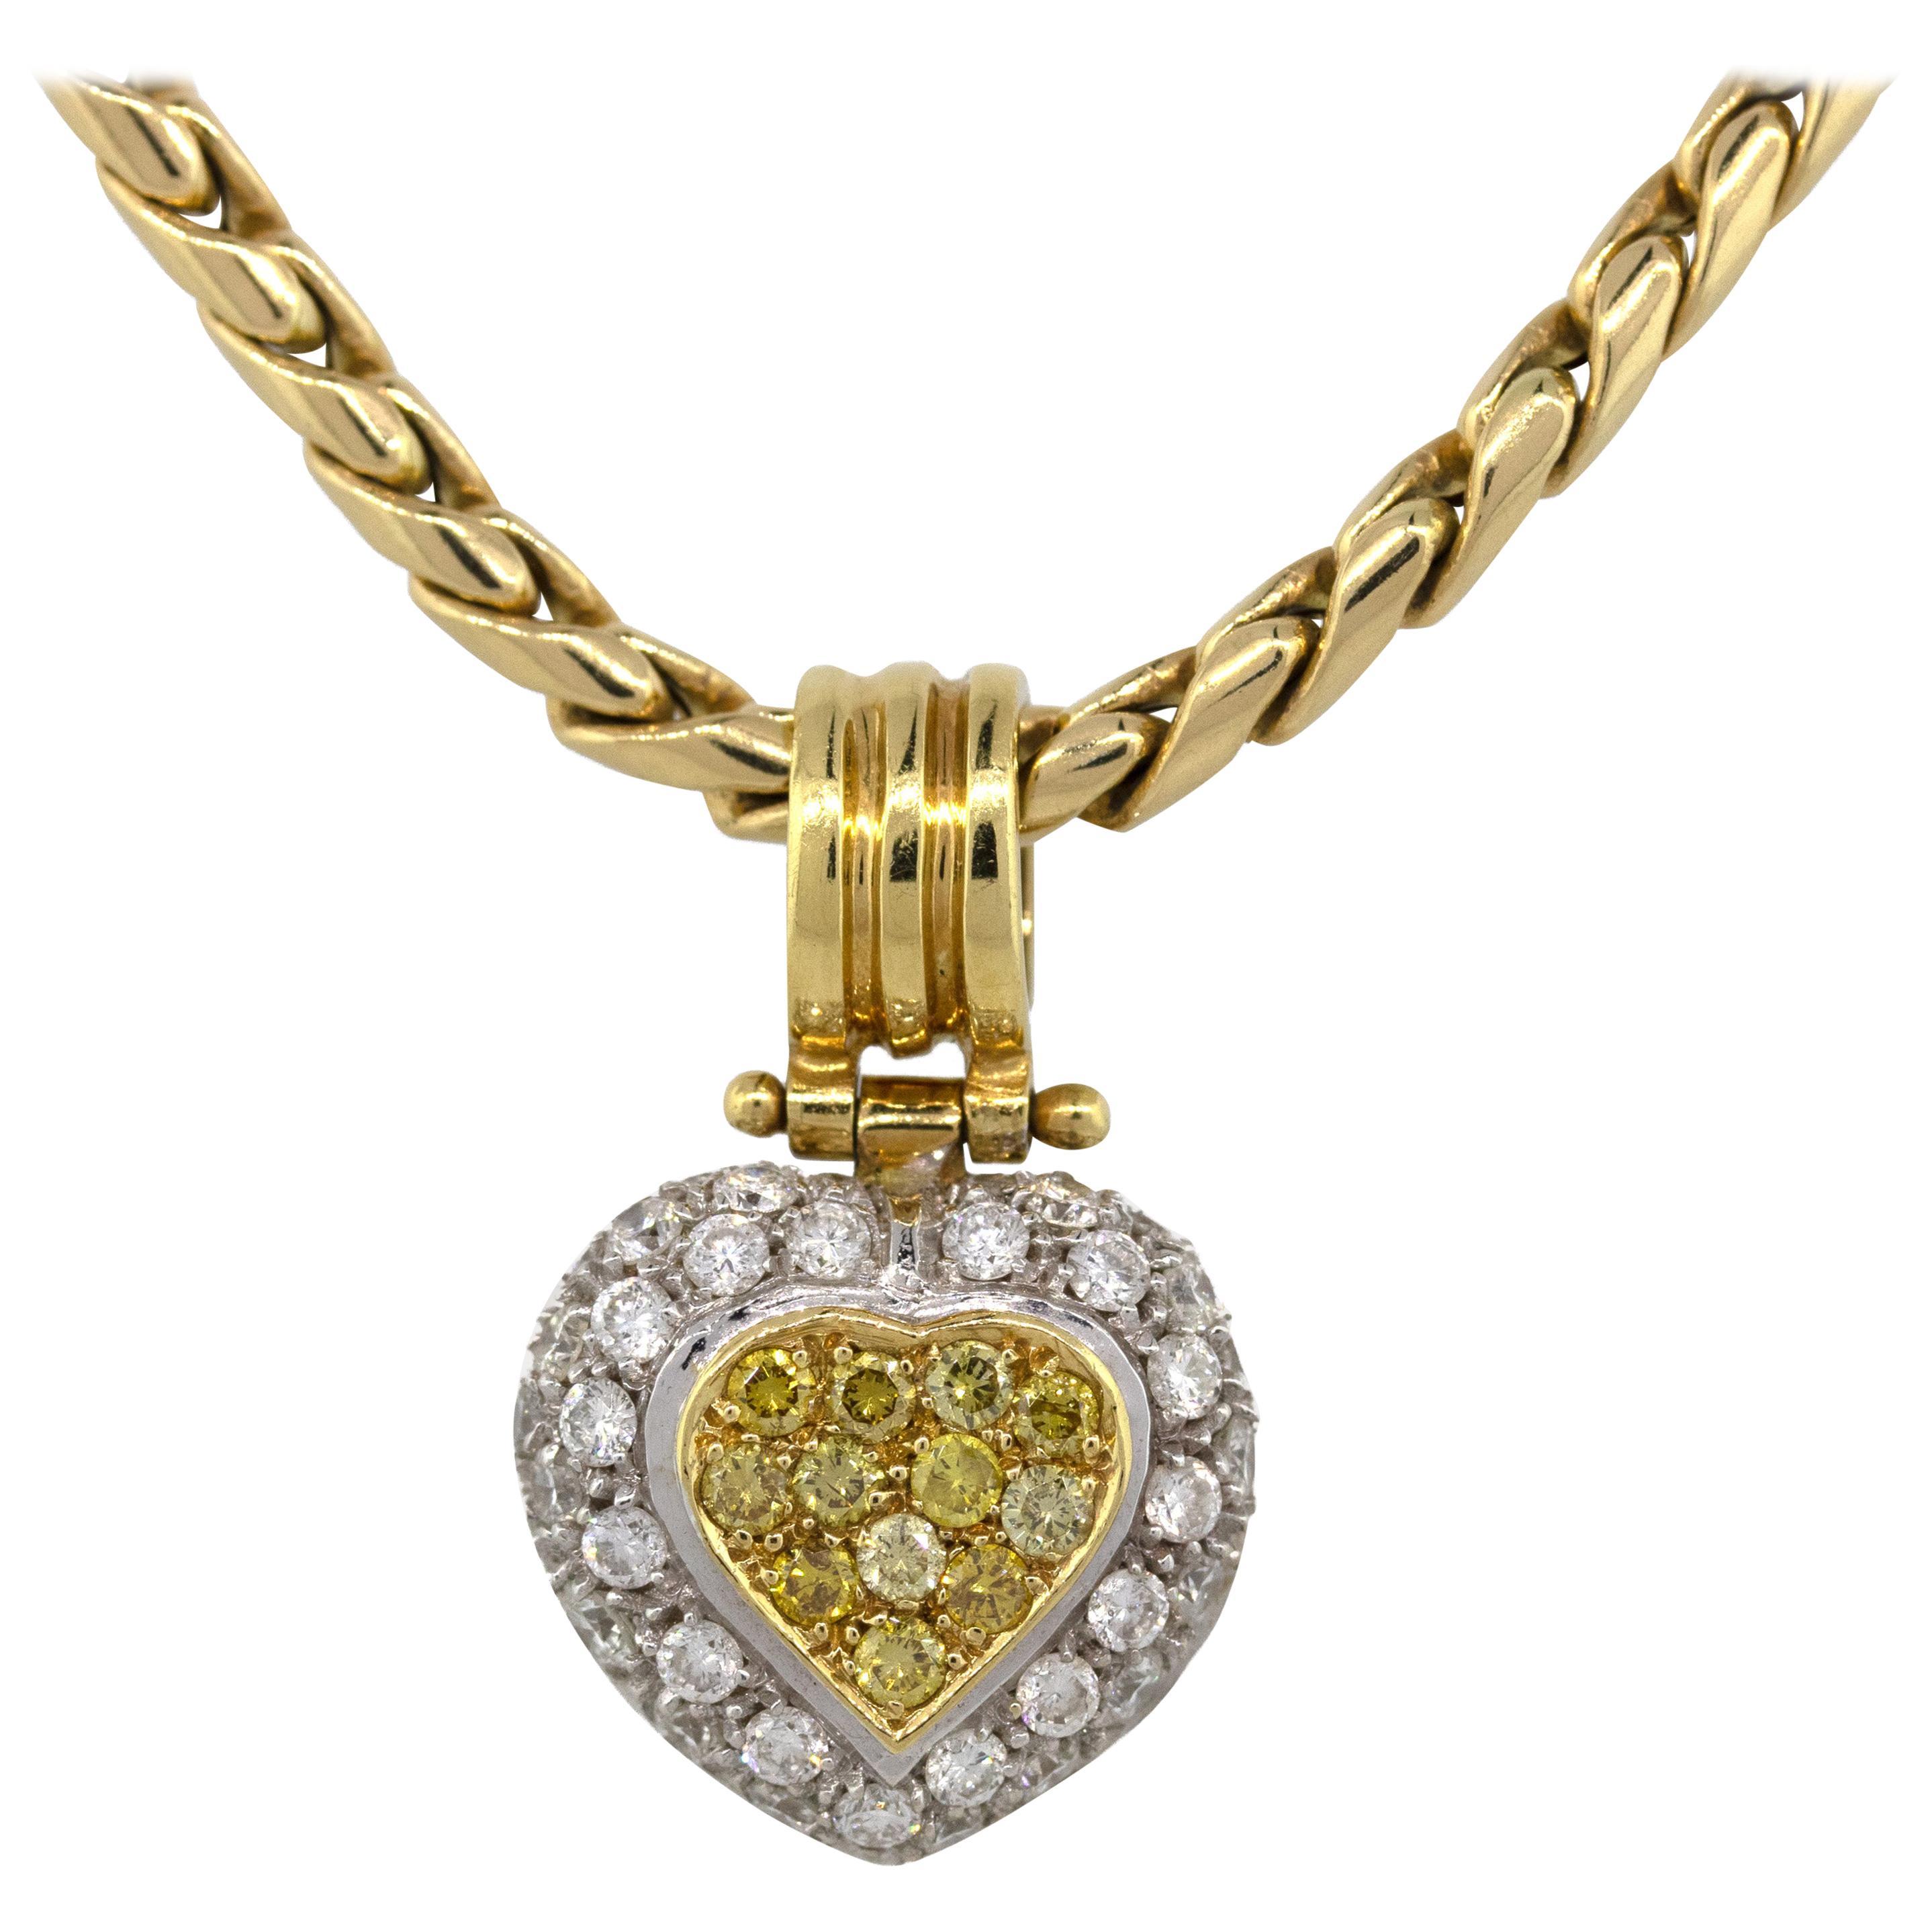 18 Karat Two-Tone Gold Pave 1 Carat Diamond Heart on Yellow Gold Chain